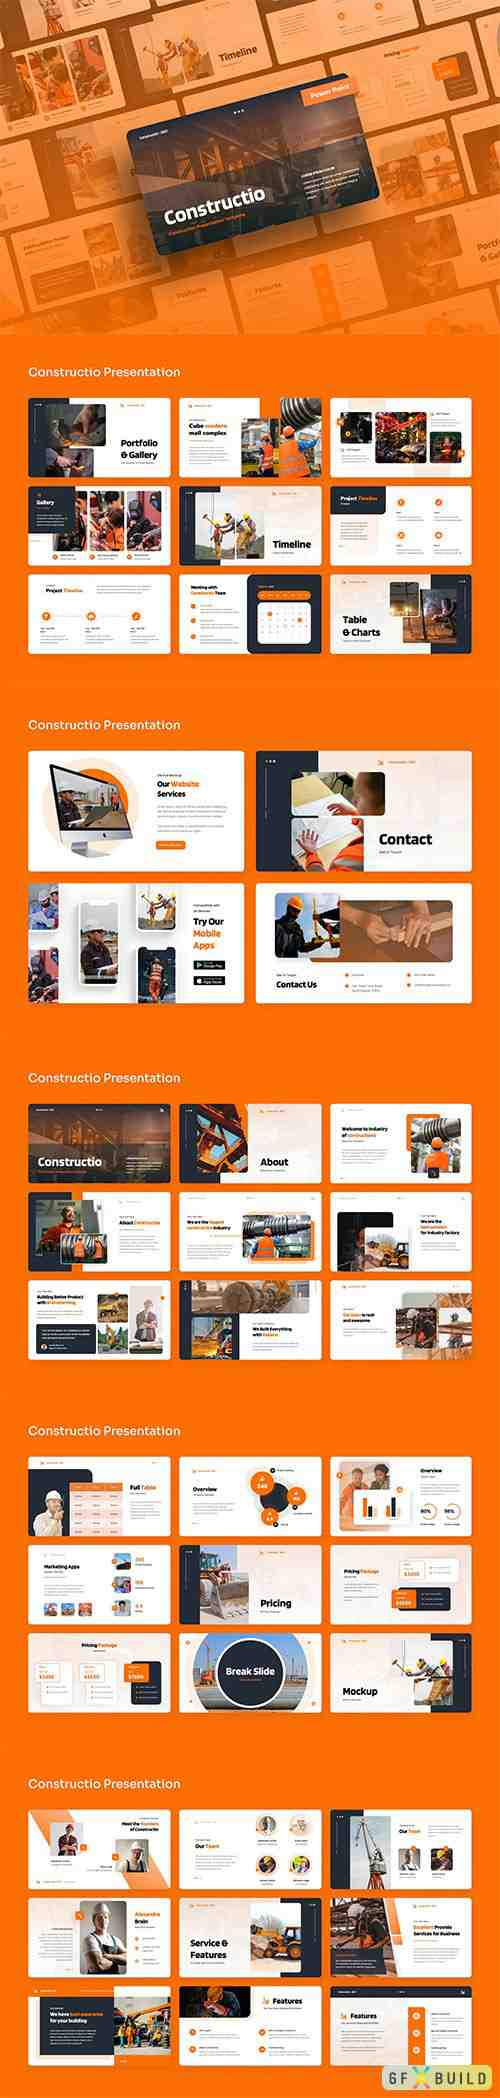 Constructio - Construction PowerPoint Presentation